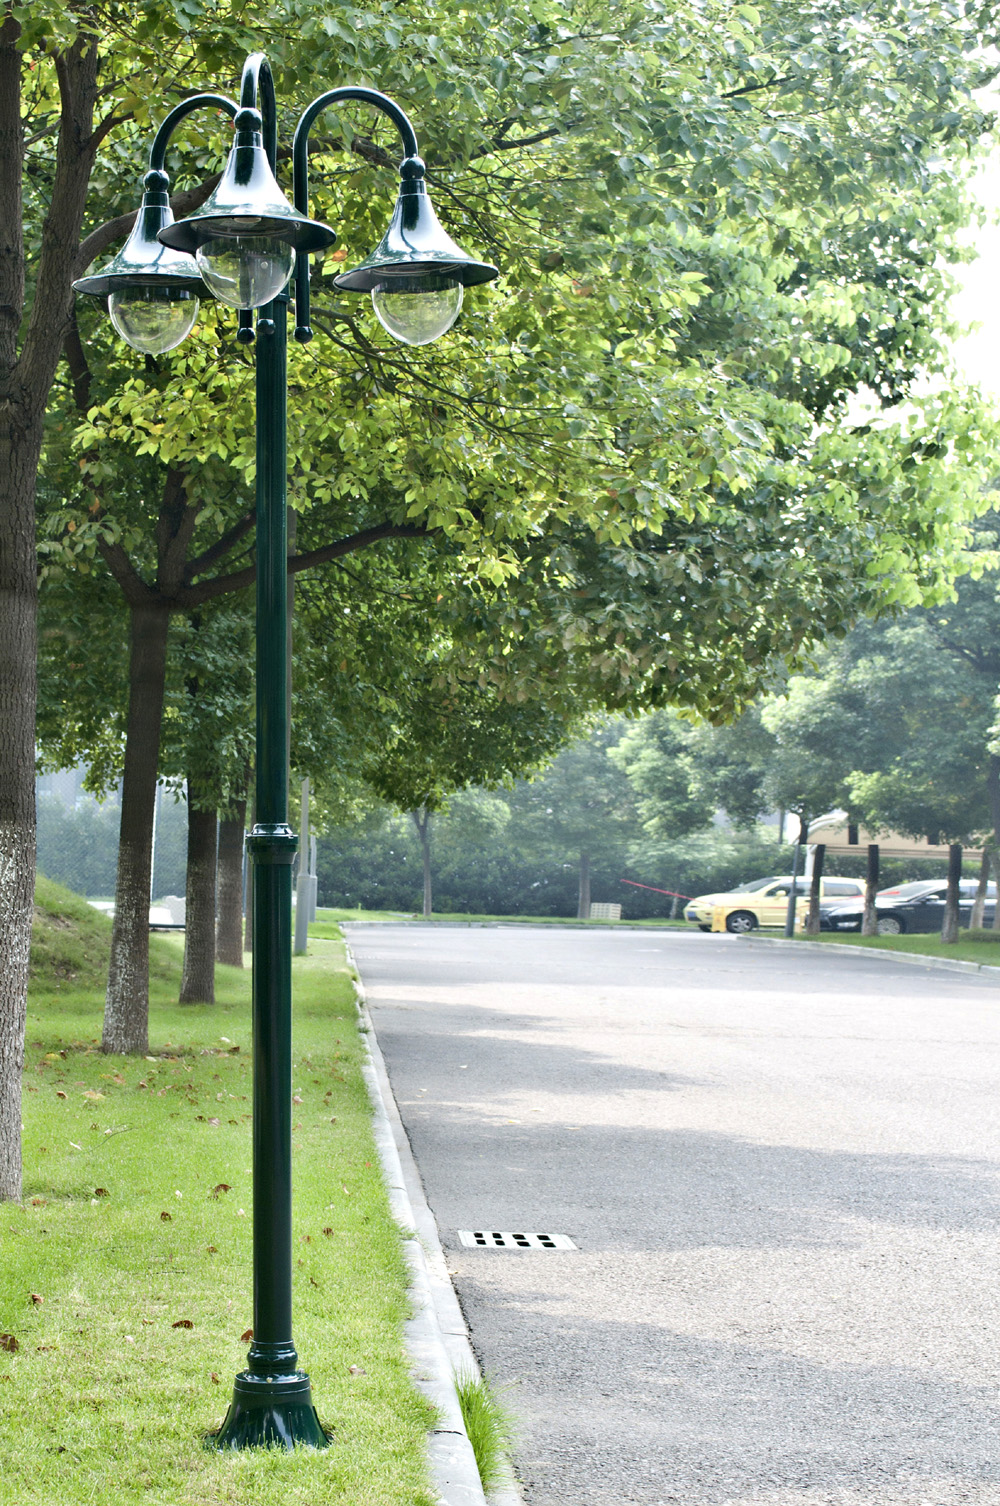 lampadaire vert lampe jardin ext rieur 3 t tes. Black Bedroom Furniture Sets. Home Design Ideas